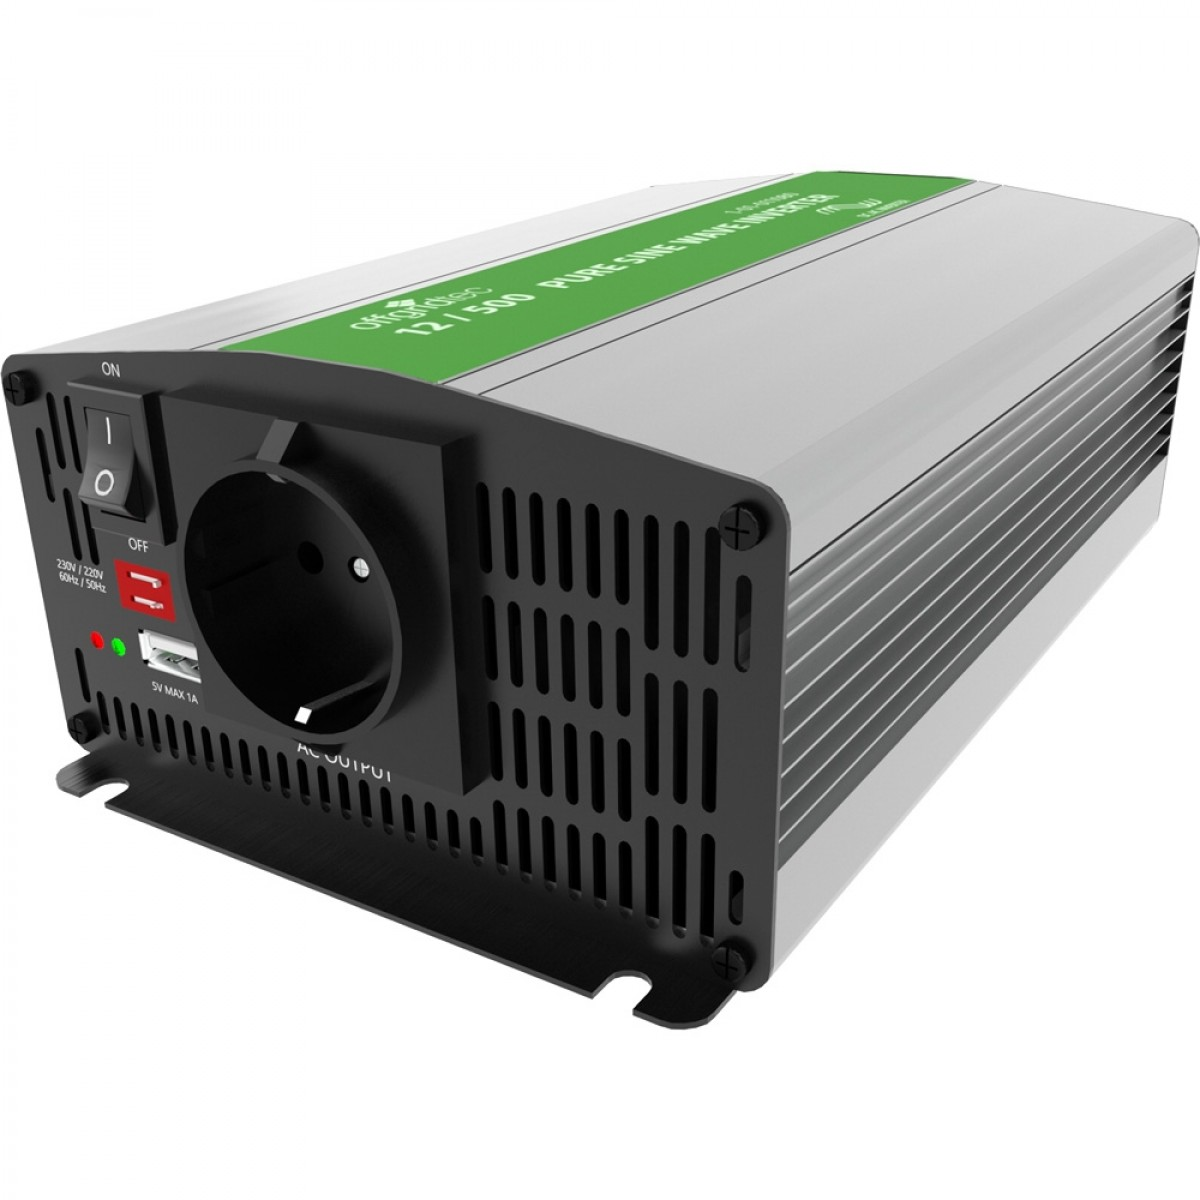 Offgridtec Spannungswandler 400W/500W/1000W 6